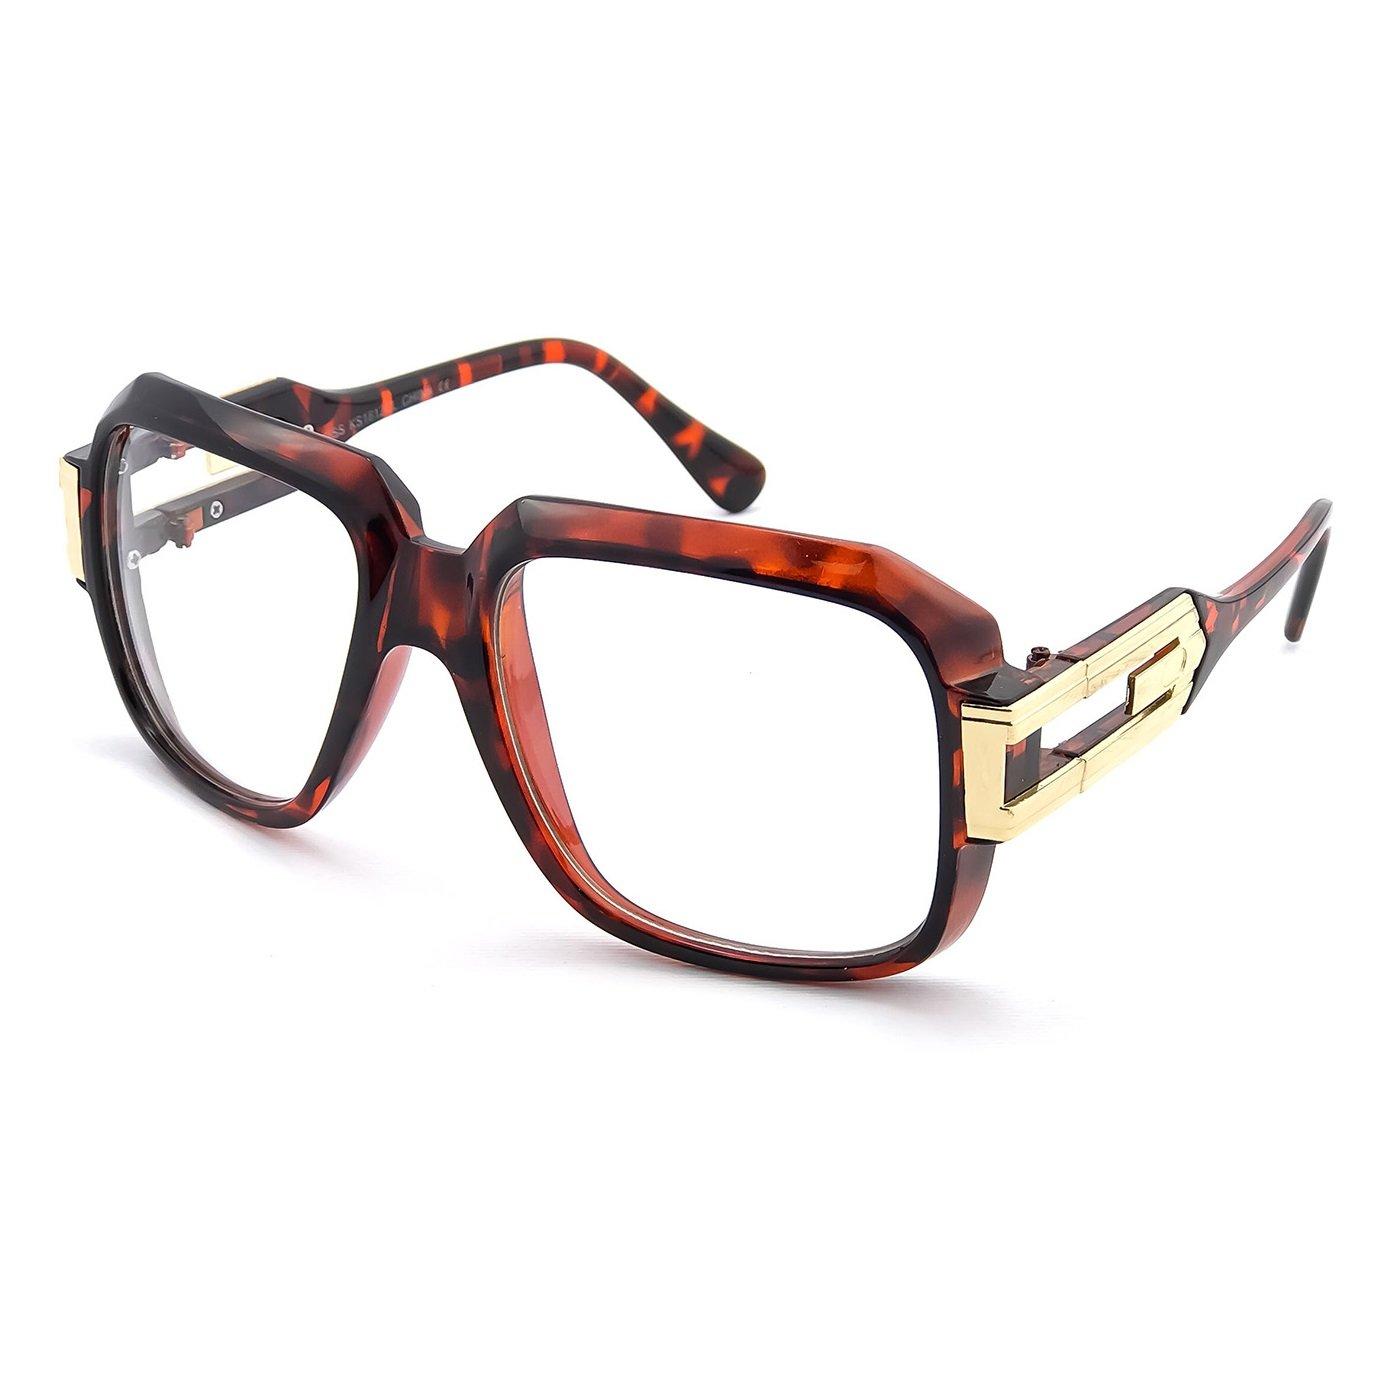 KISS Gafas neutral OLD SCHOOL mod. BURST - marco óptica HIP ...